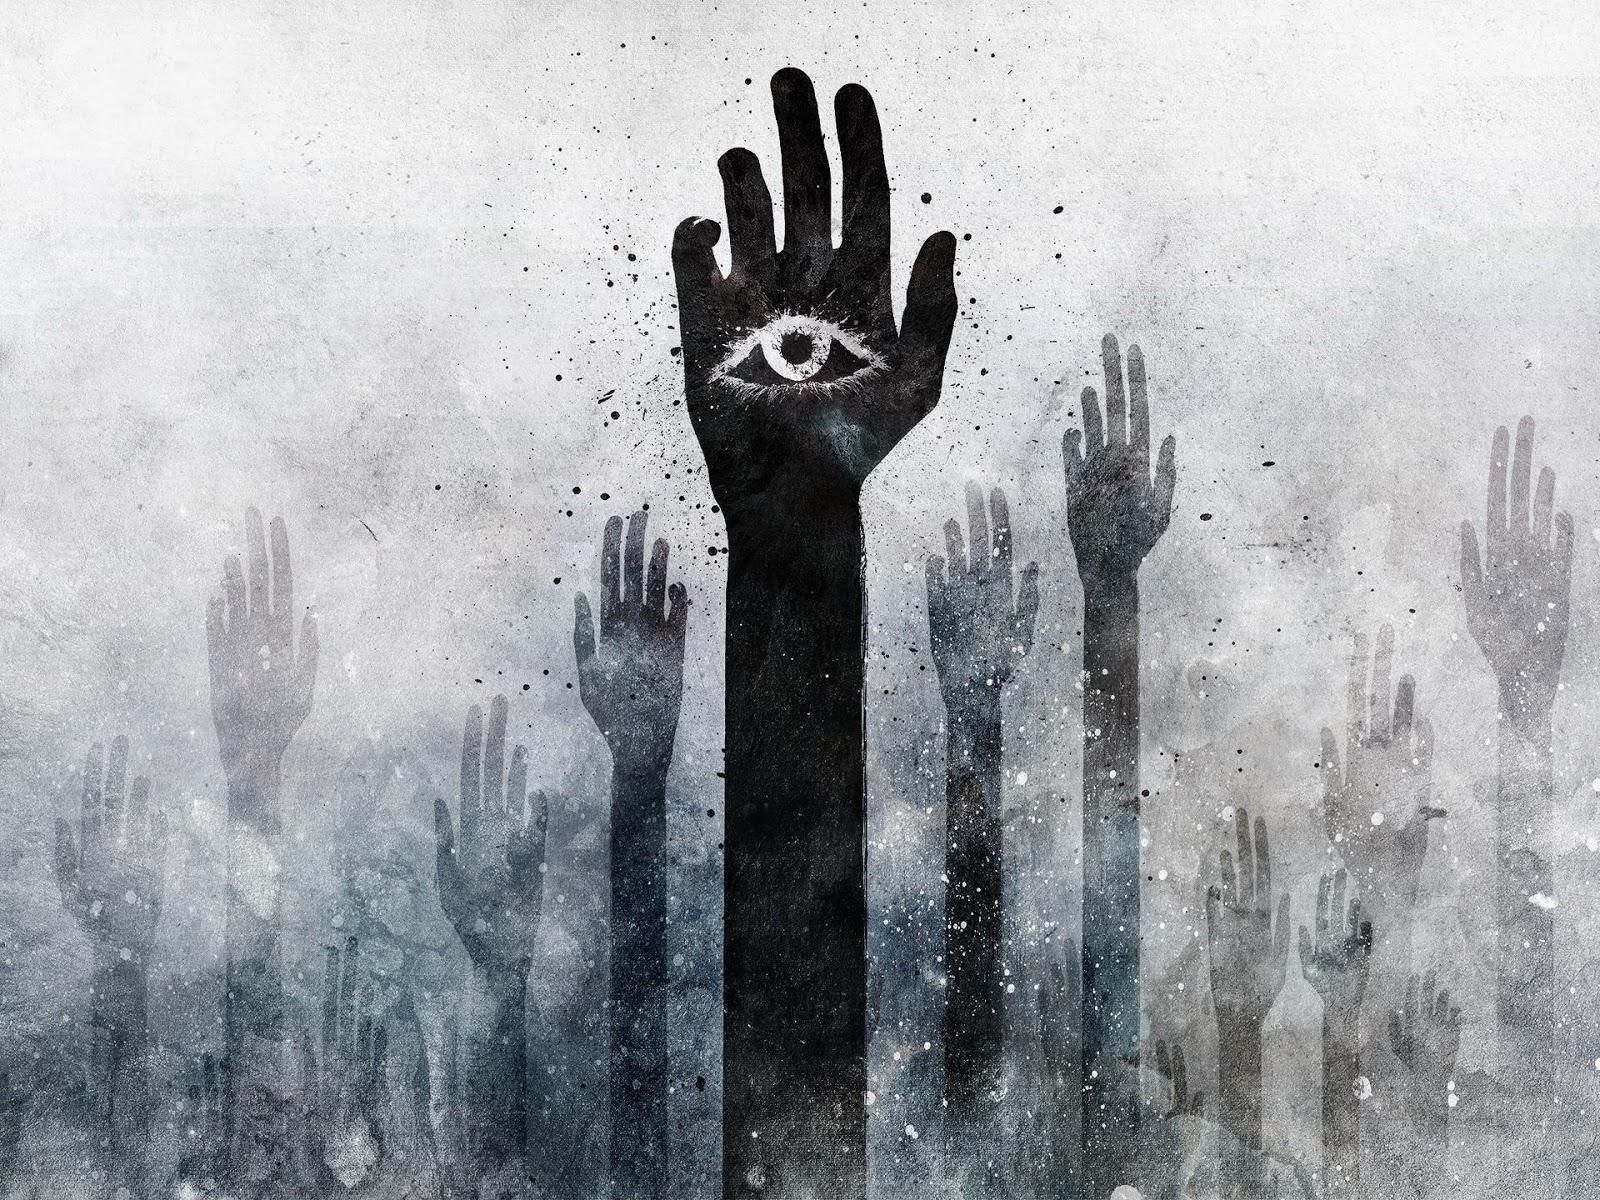 Hd wallpaper evil - Evil Eye Wallpaper